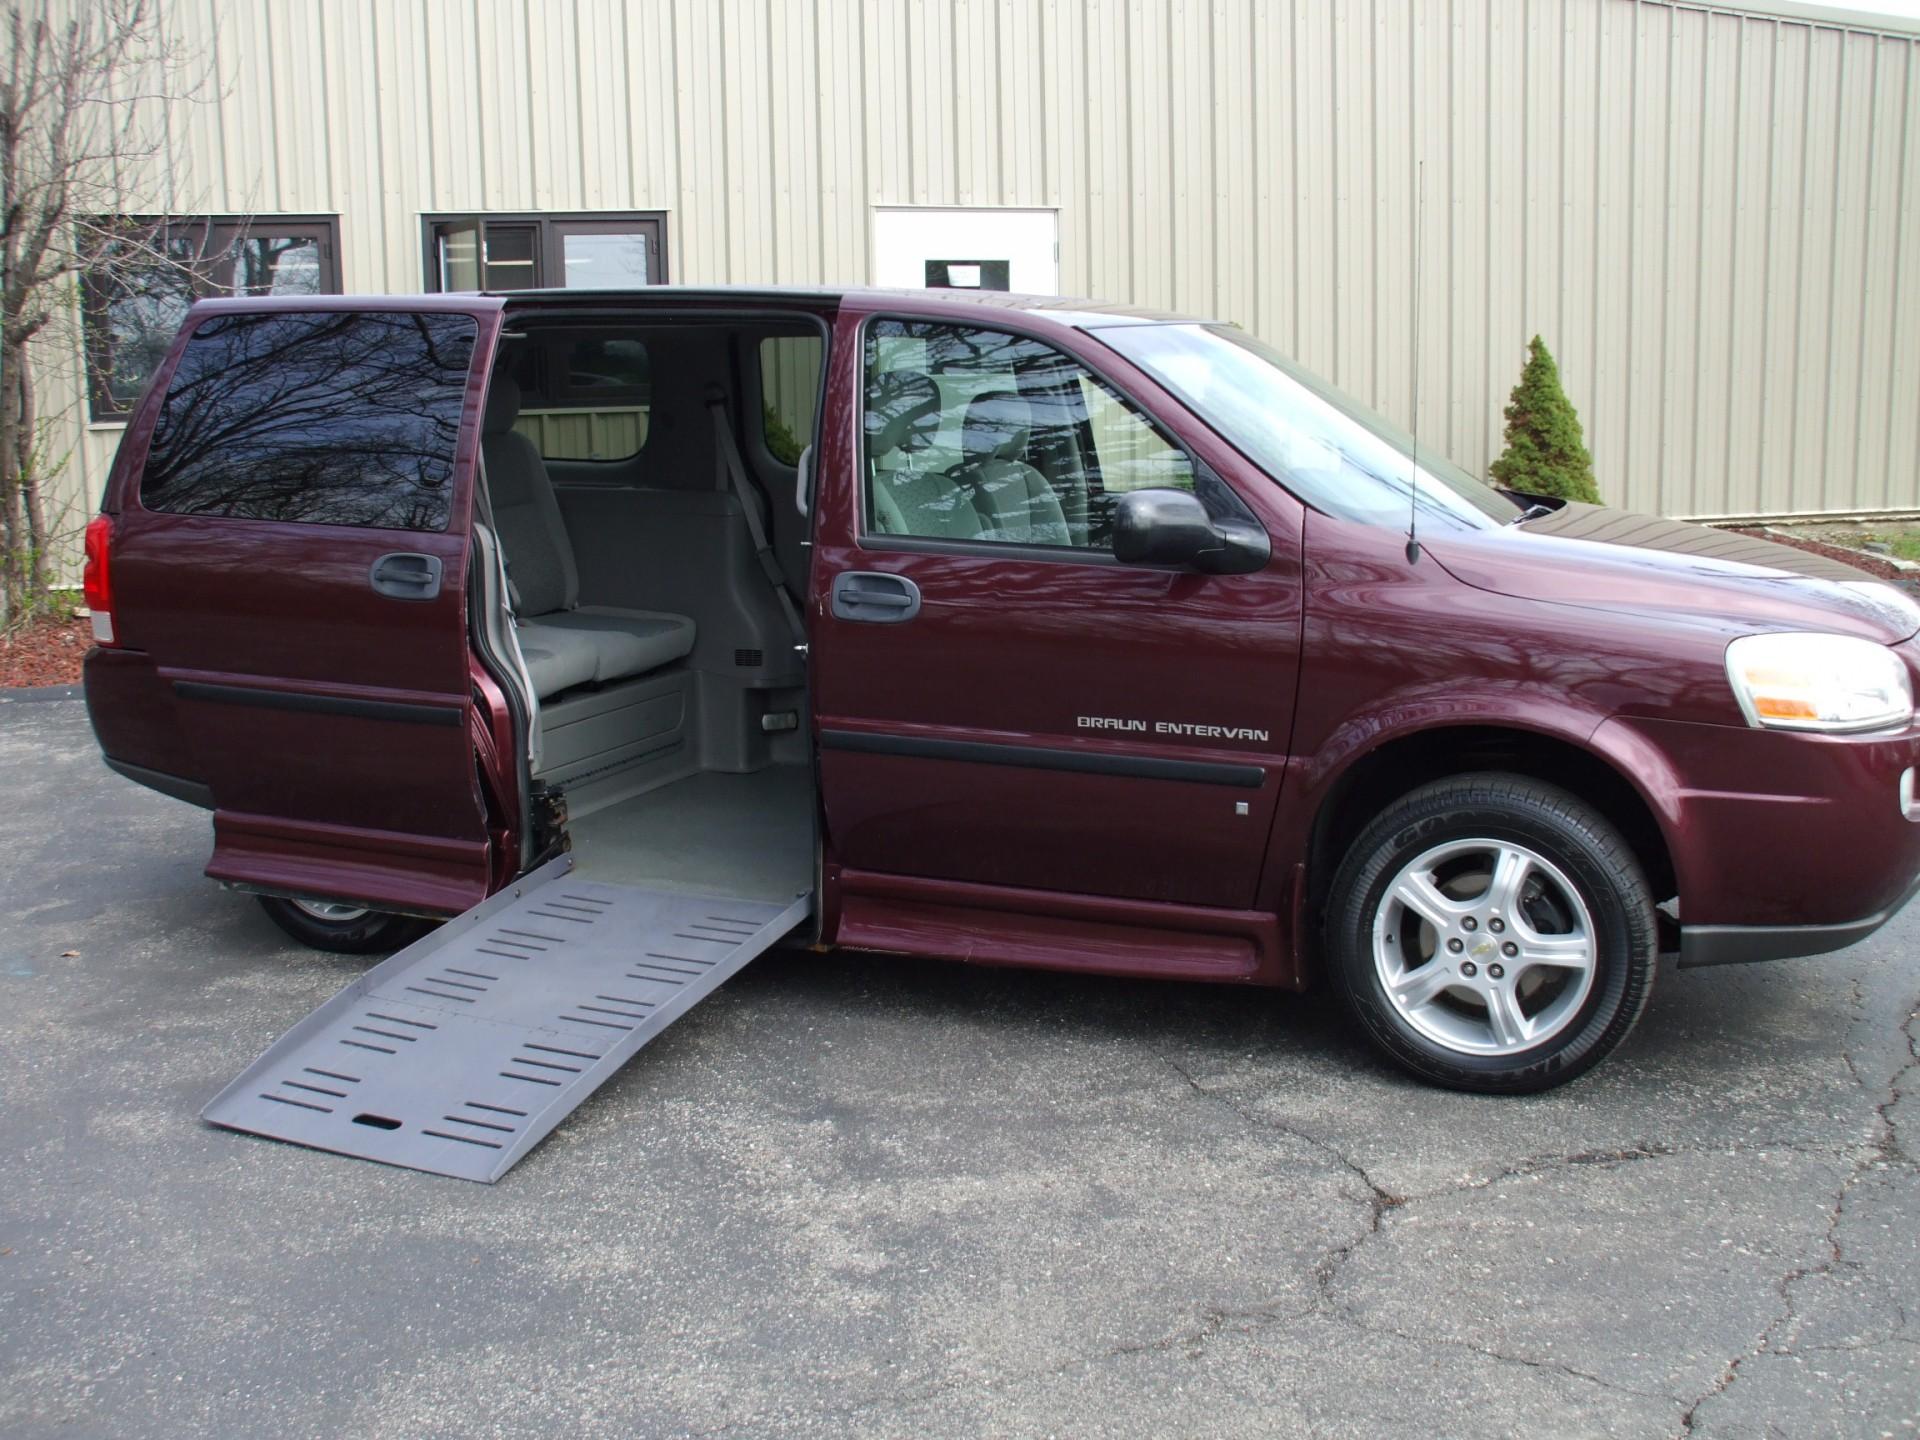 2006 Chevrolet Uplander Stock 242460 Wheelchair Van For Sale Gresham Driving Aids